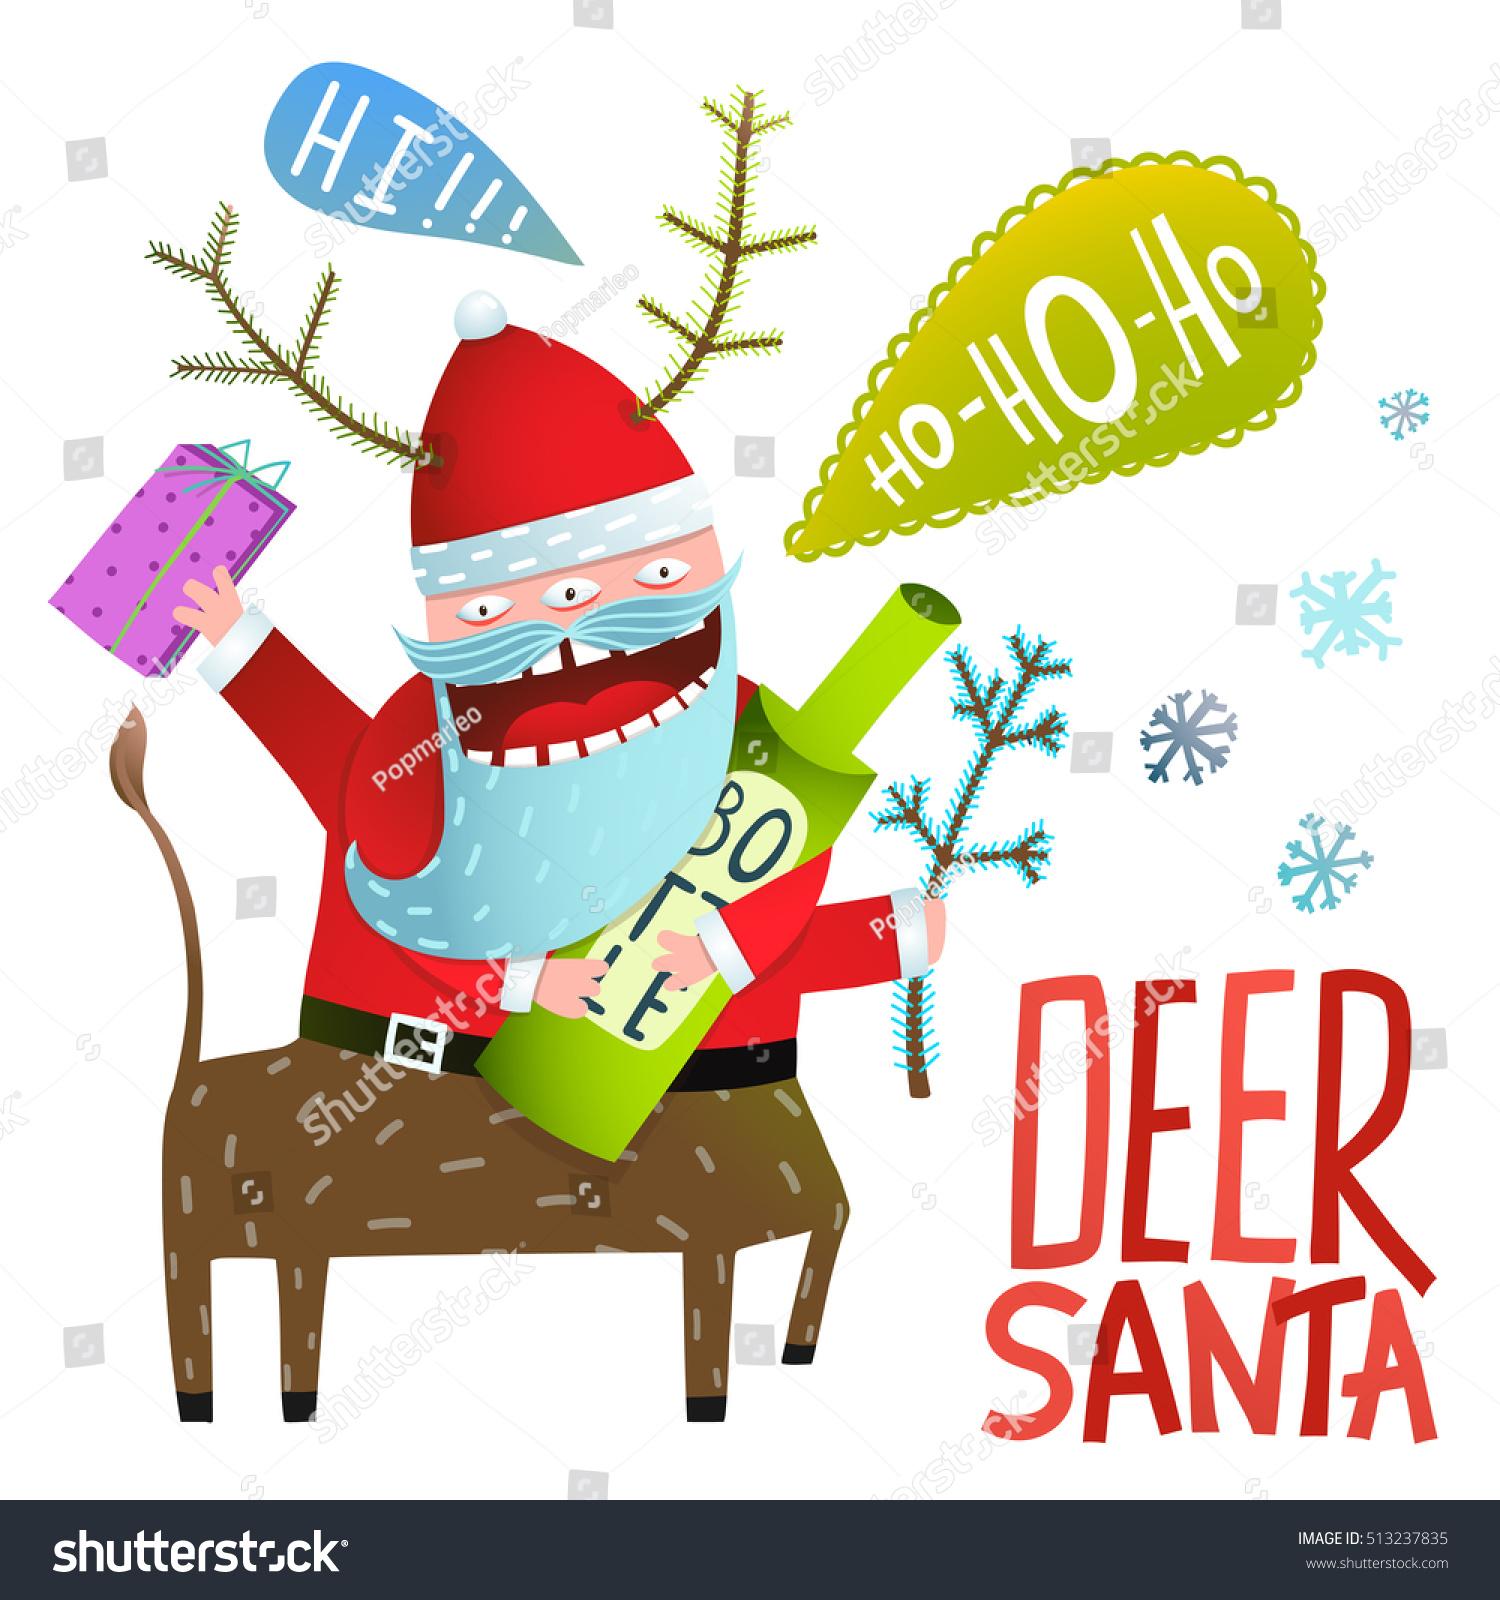 Monster santa deer christmas new year stock vector 513237835 monster santa deer christmas or new year celebration holiday greetings deer santa with bottle of kristyandbryce Image collections